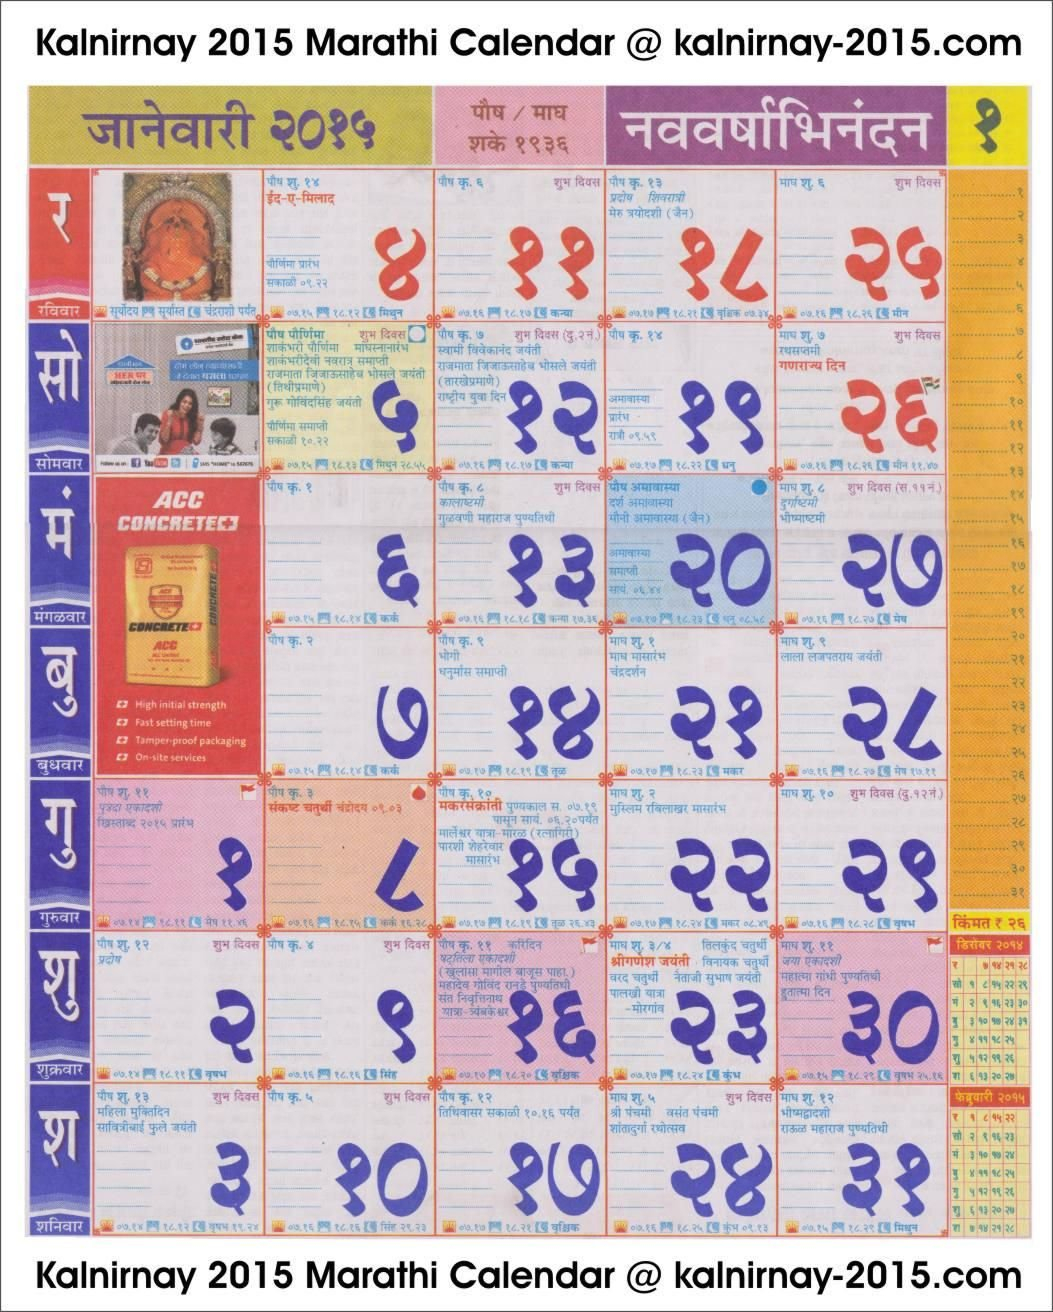 January 2015 Marathi Kalnirnay Calendar   2015 Kalnirnay Marathi Calendar 2019 Kalnirnay